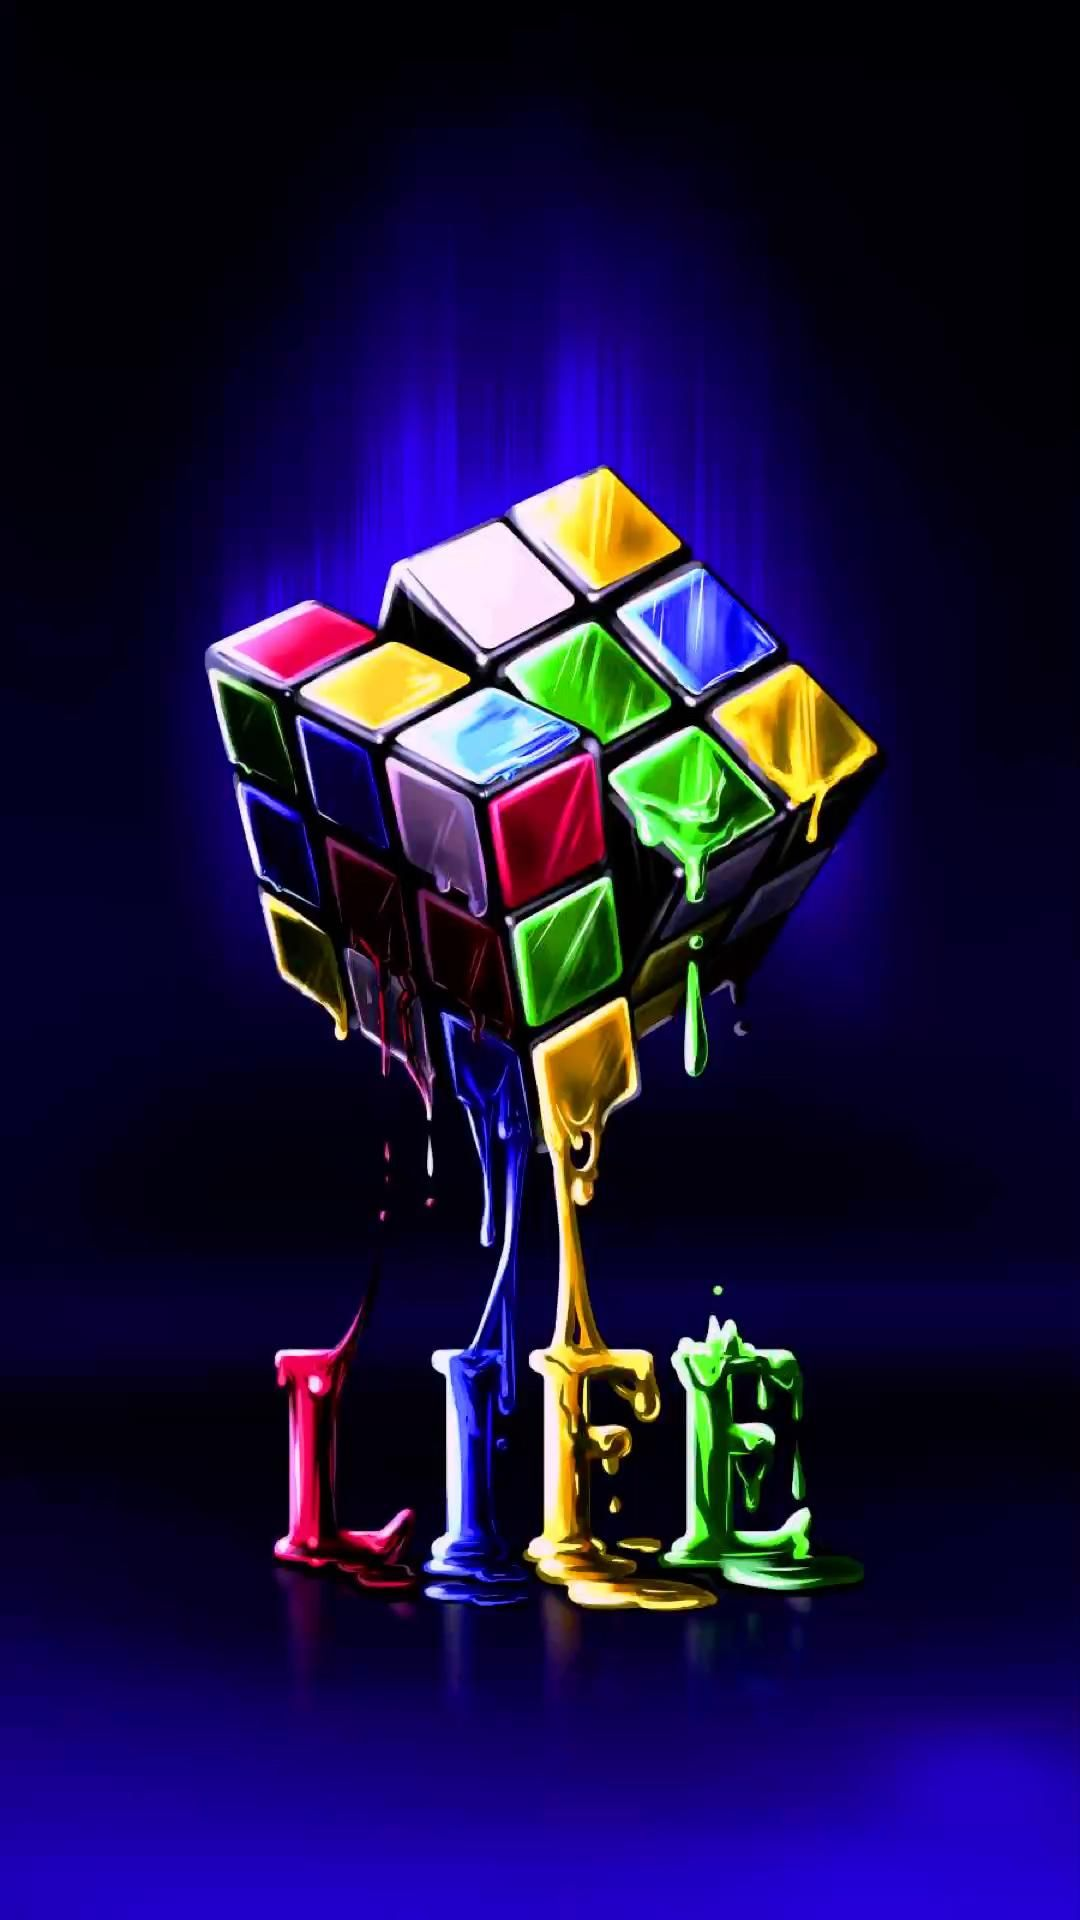 Rubik's Cube Wallpaper 794